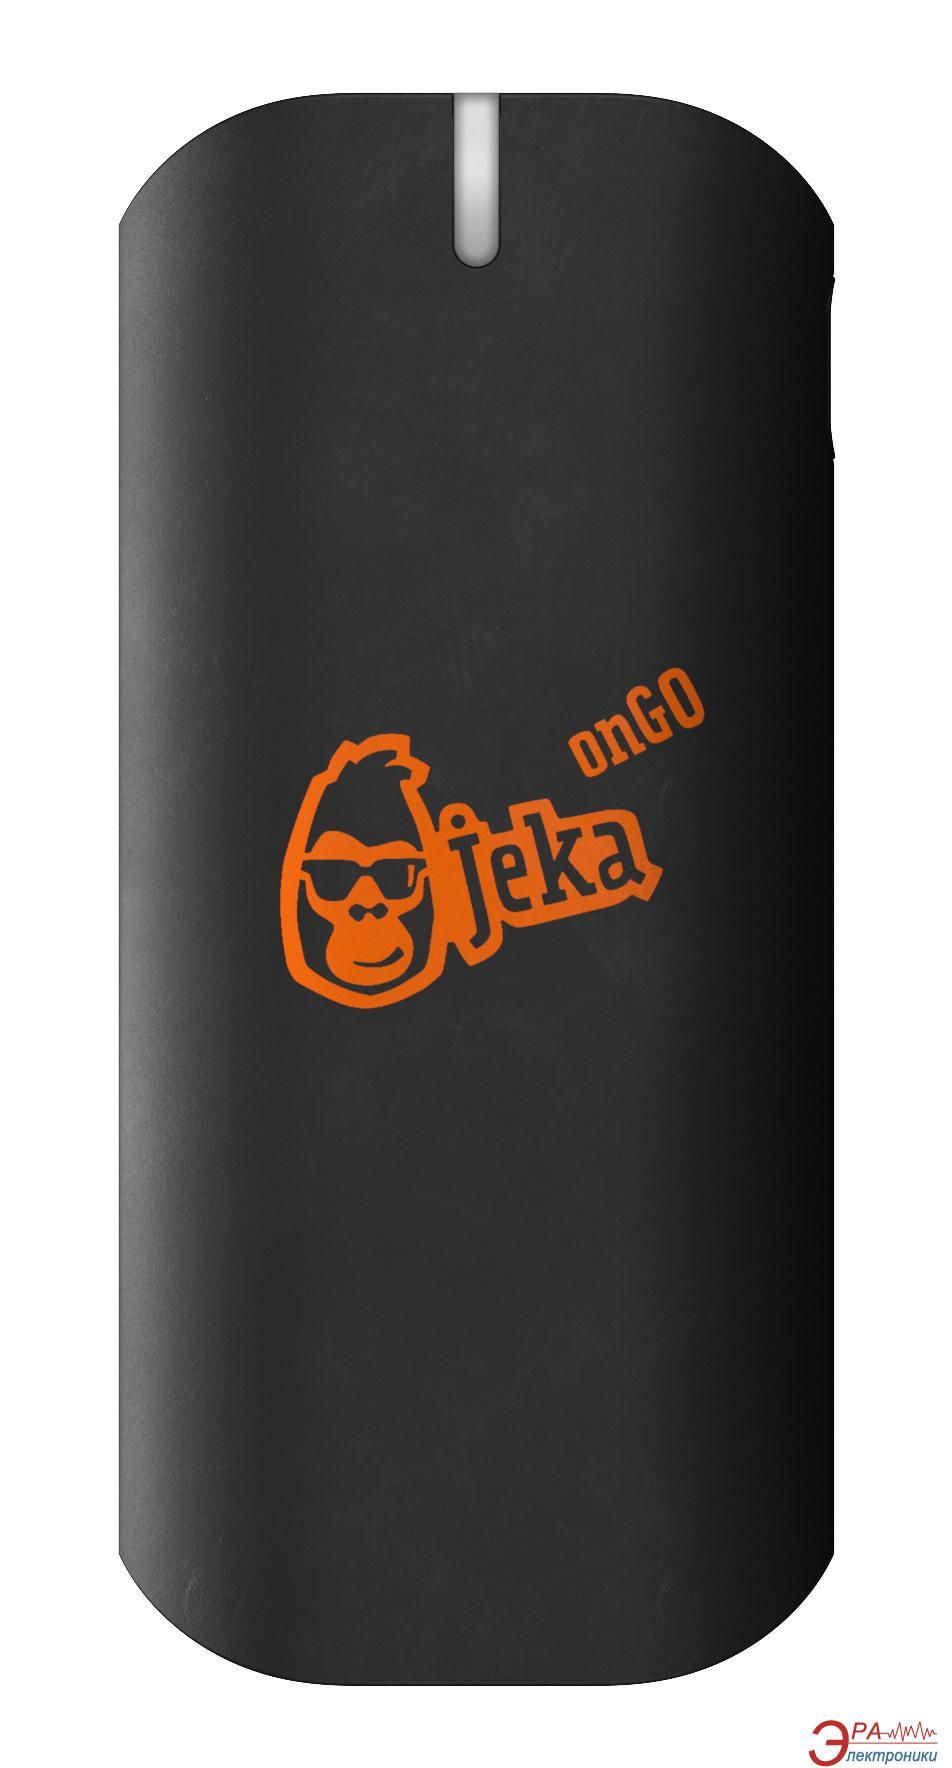 Внешний аккумулятор (PowerBank) Jeka onGO 5600 mAh